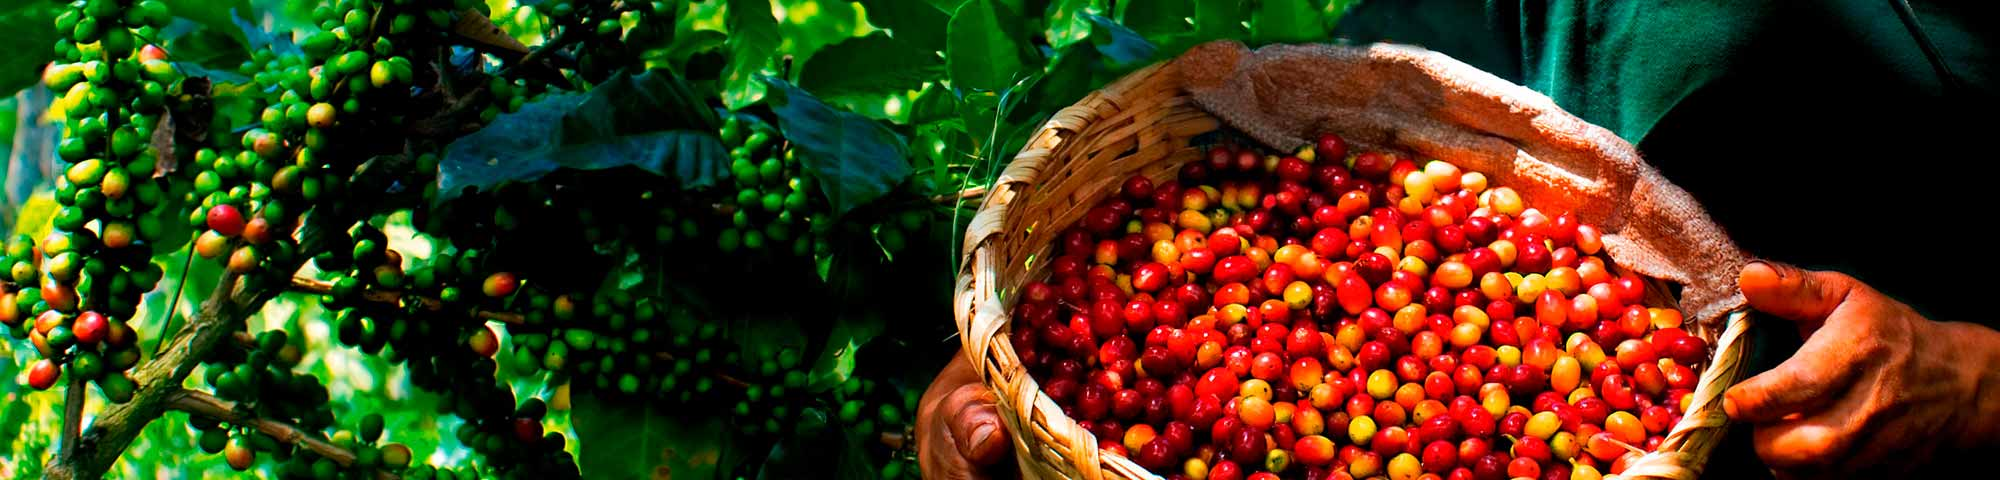 Plantas Procesadoras de café (Chanchamayo Highland Coffee y Café Green Gold)